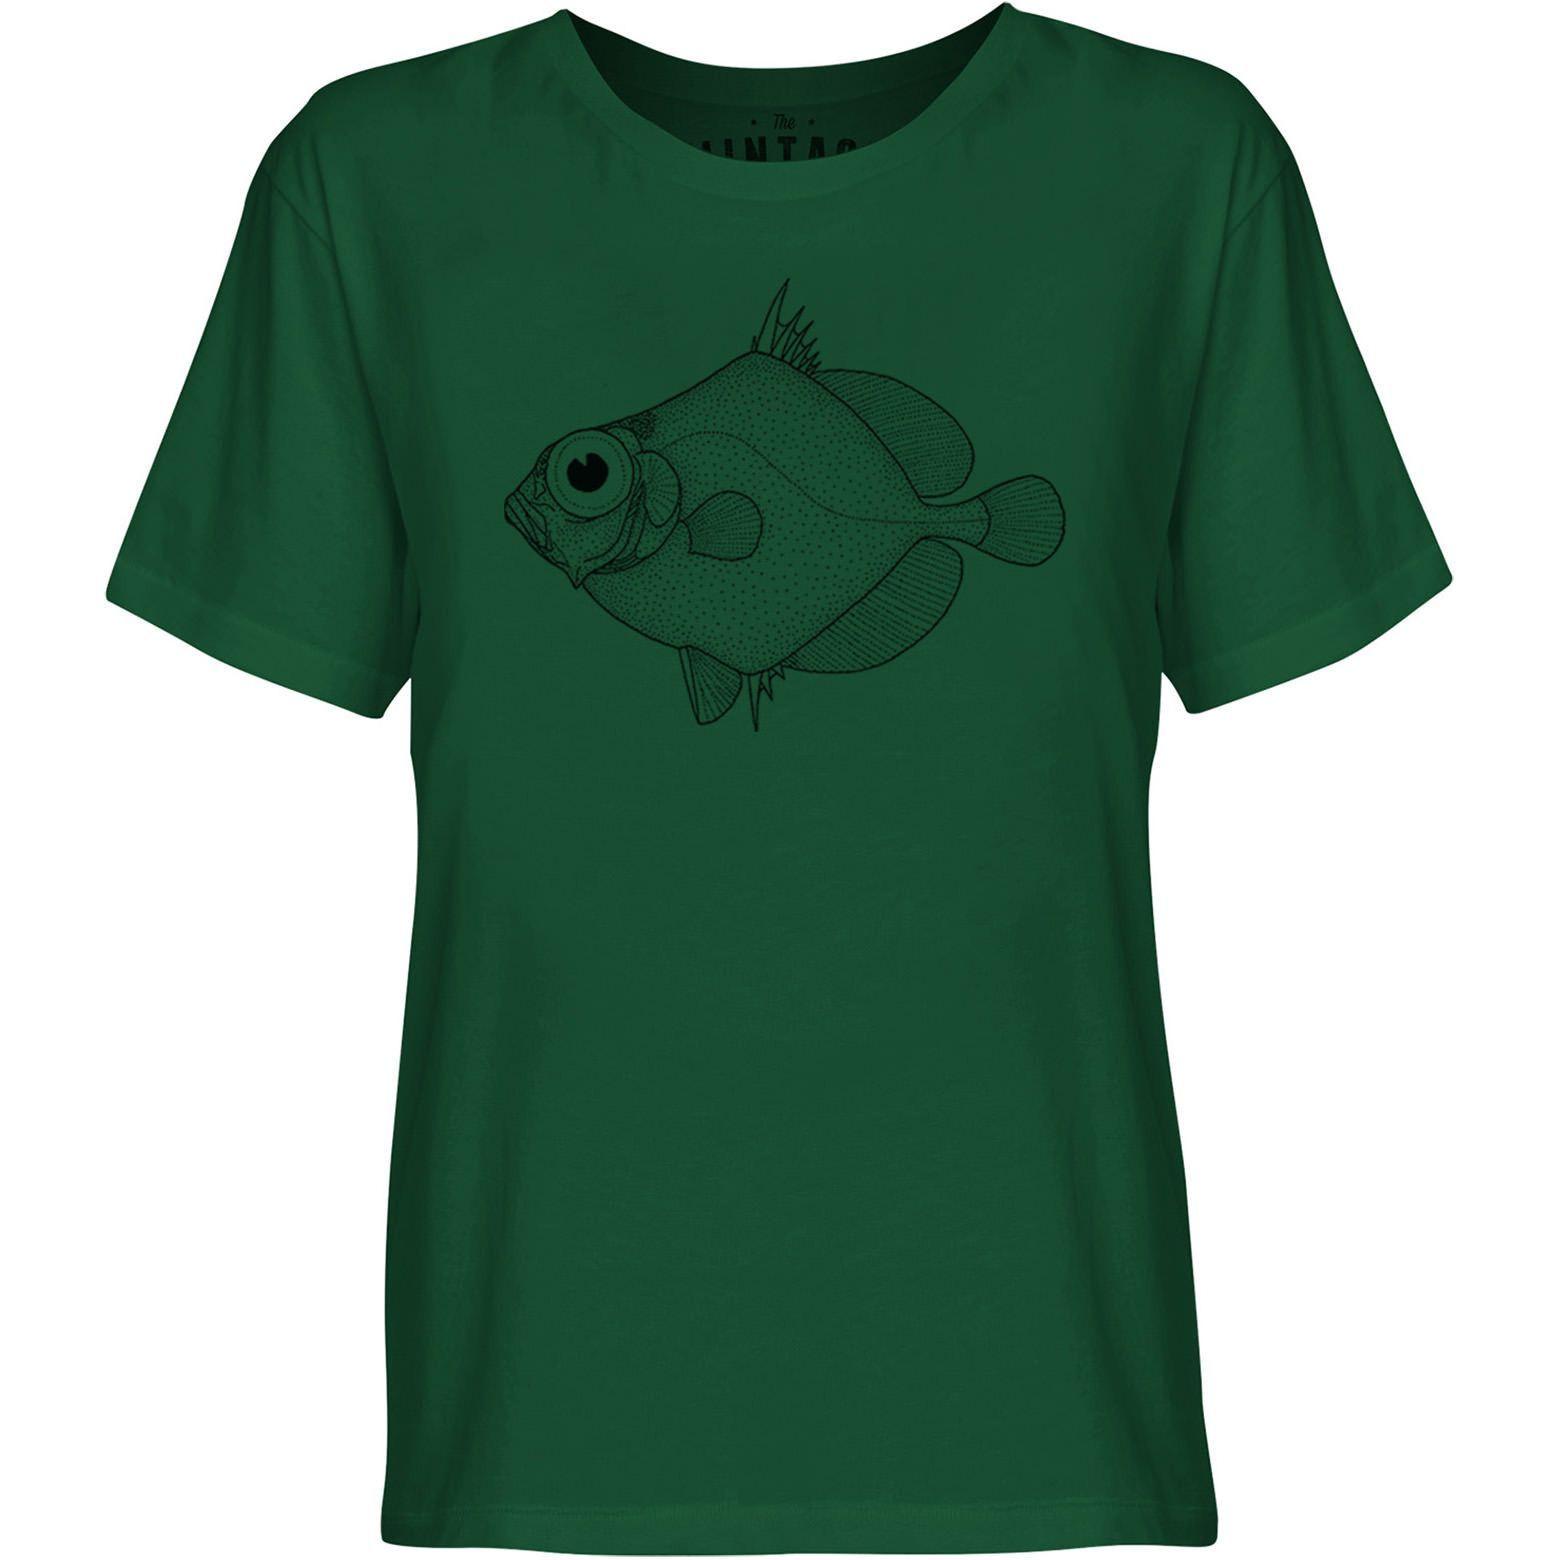 Mintage Big Eyed Fish Youth Fine Jersey T-Shirt